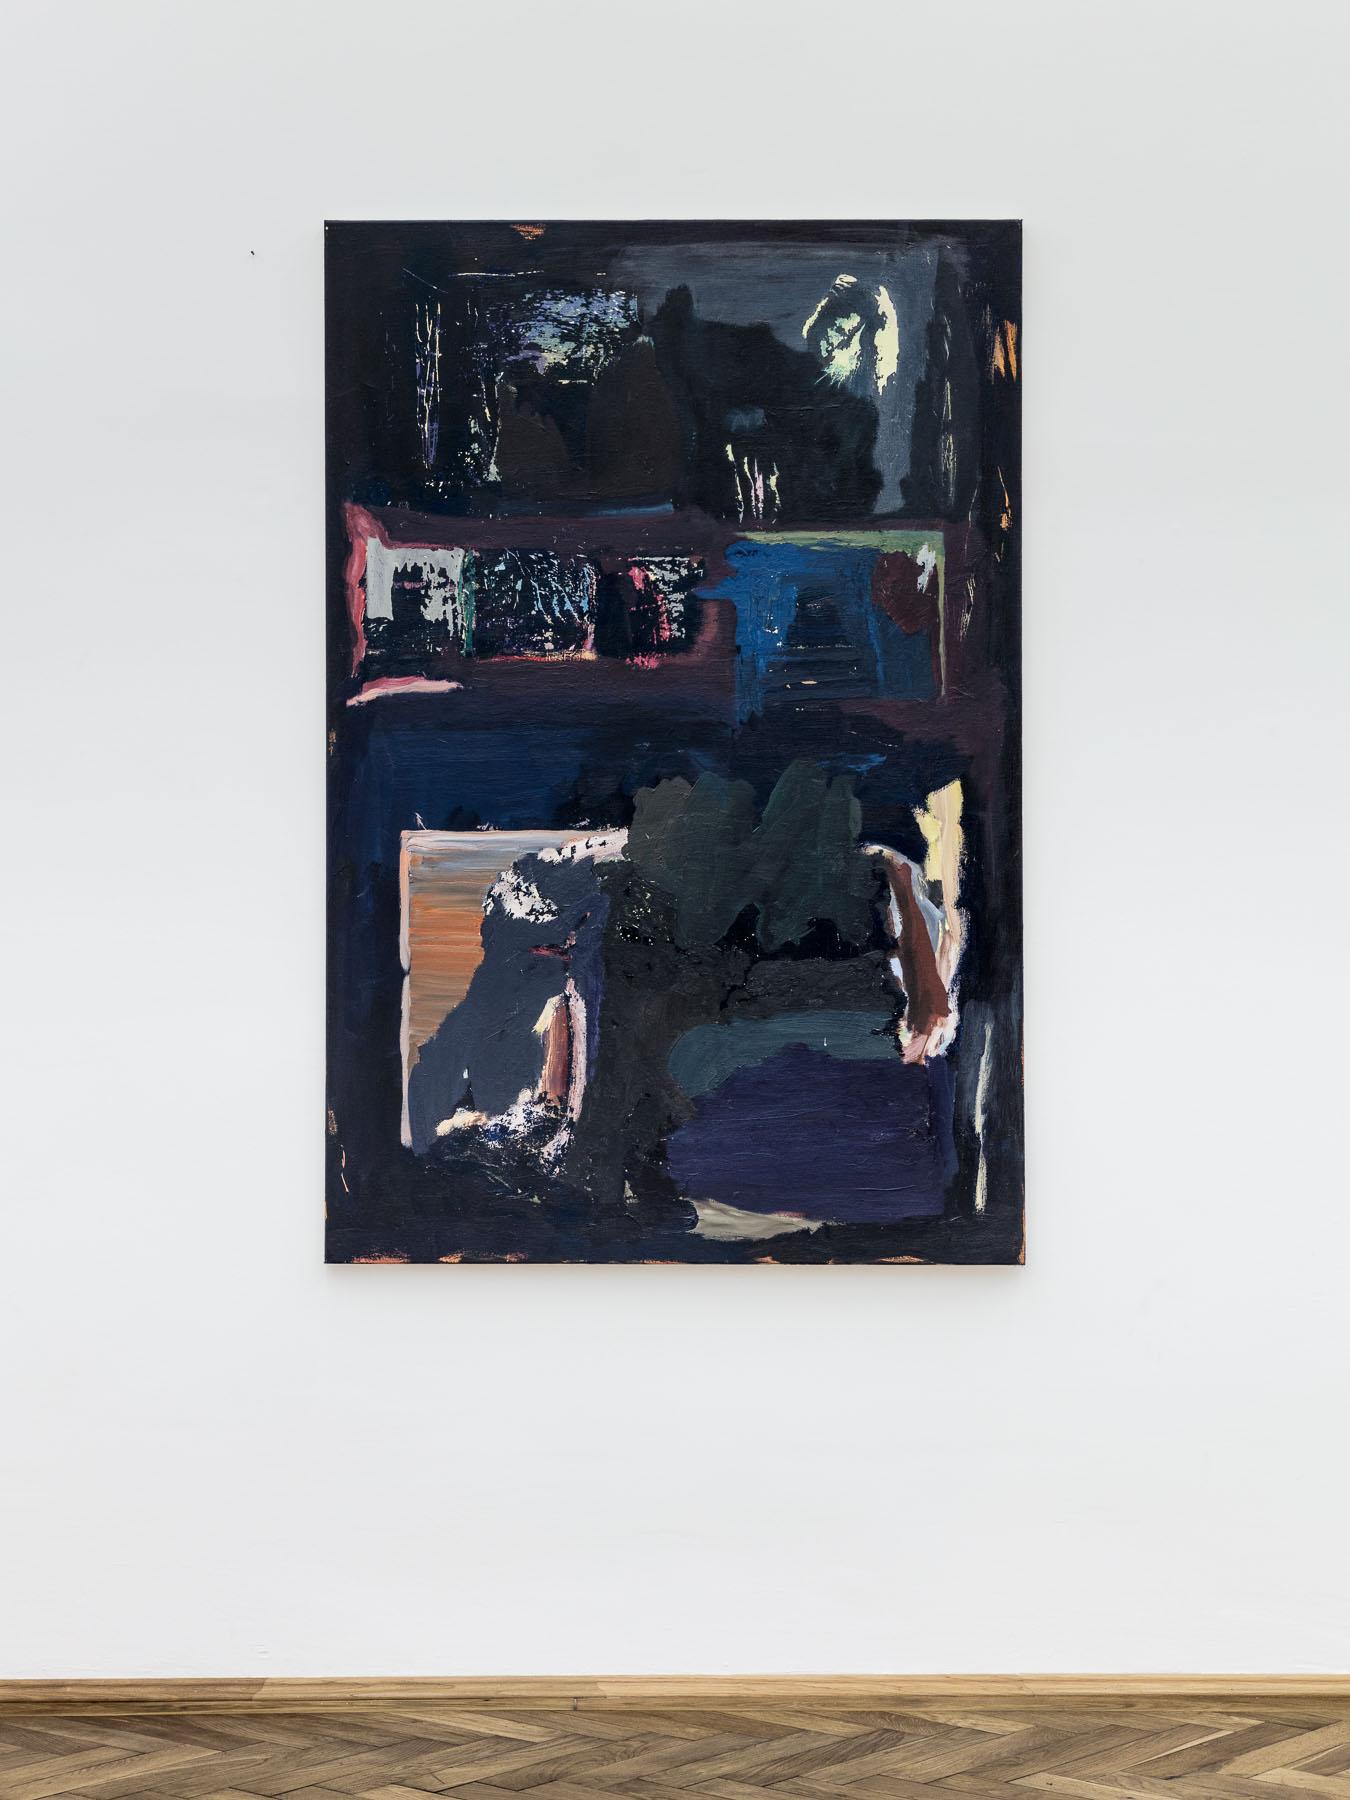 Veronika Hilger, untitled, 2016, oil on canvas, 150 x 100 cm